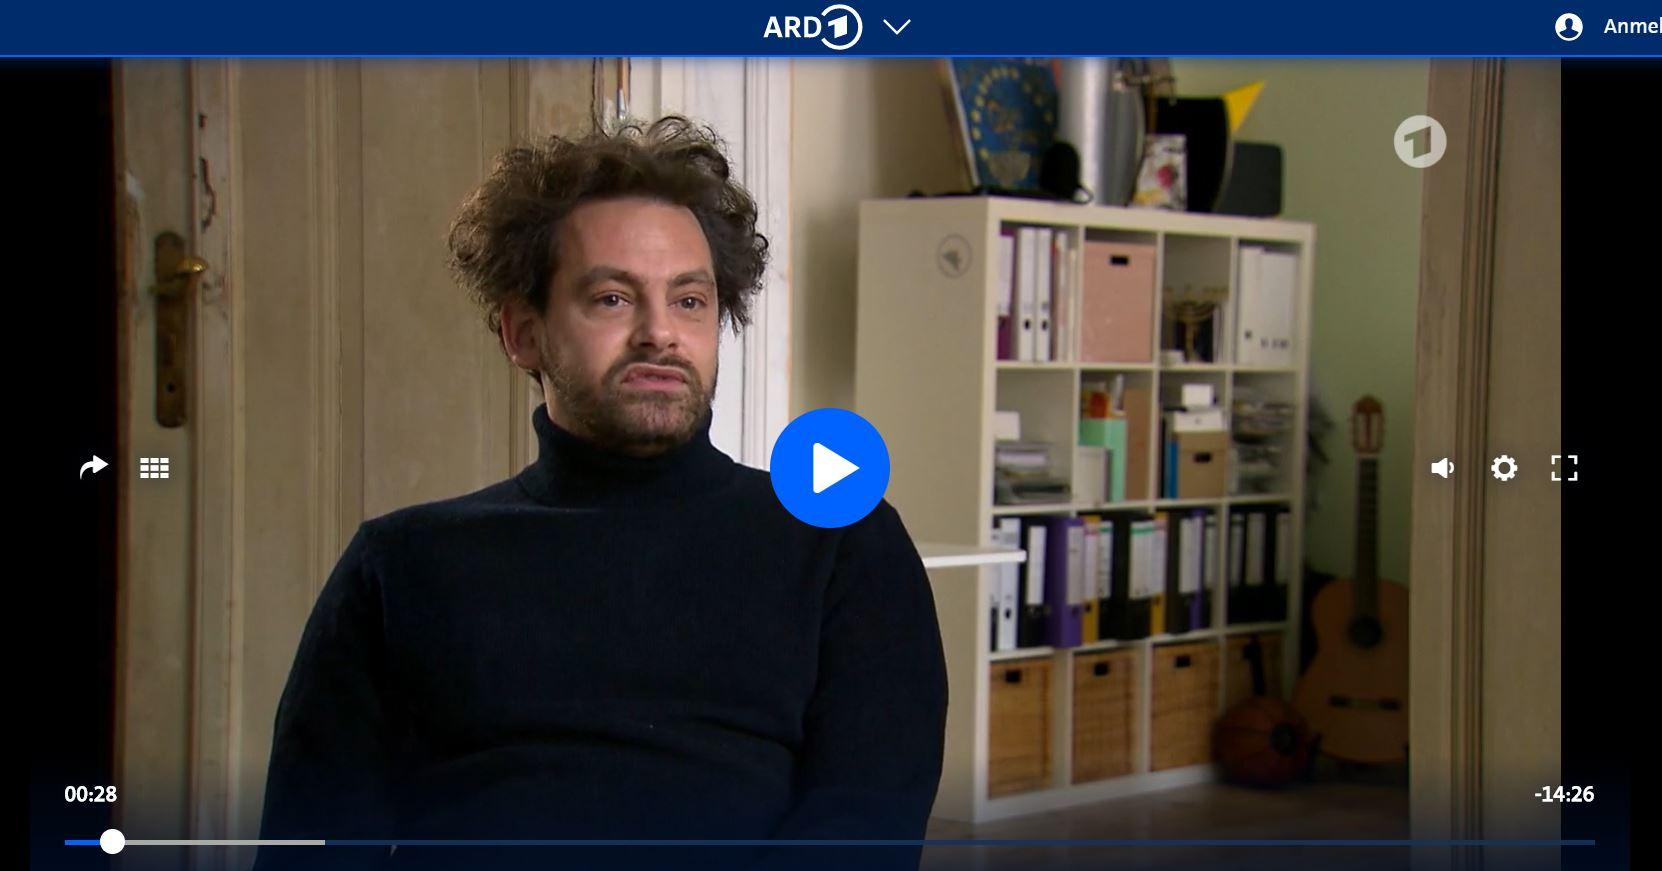 ARD-Doku: Jüdische Akzentsendung - Shai Hoffmann, der Mutmacher